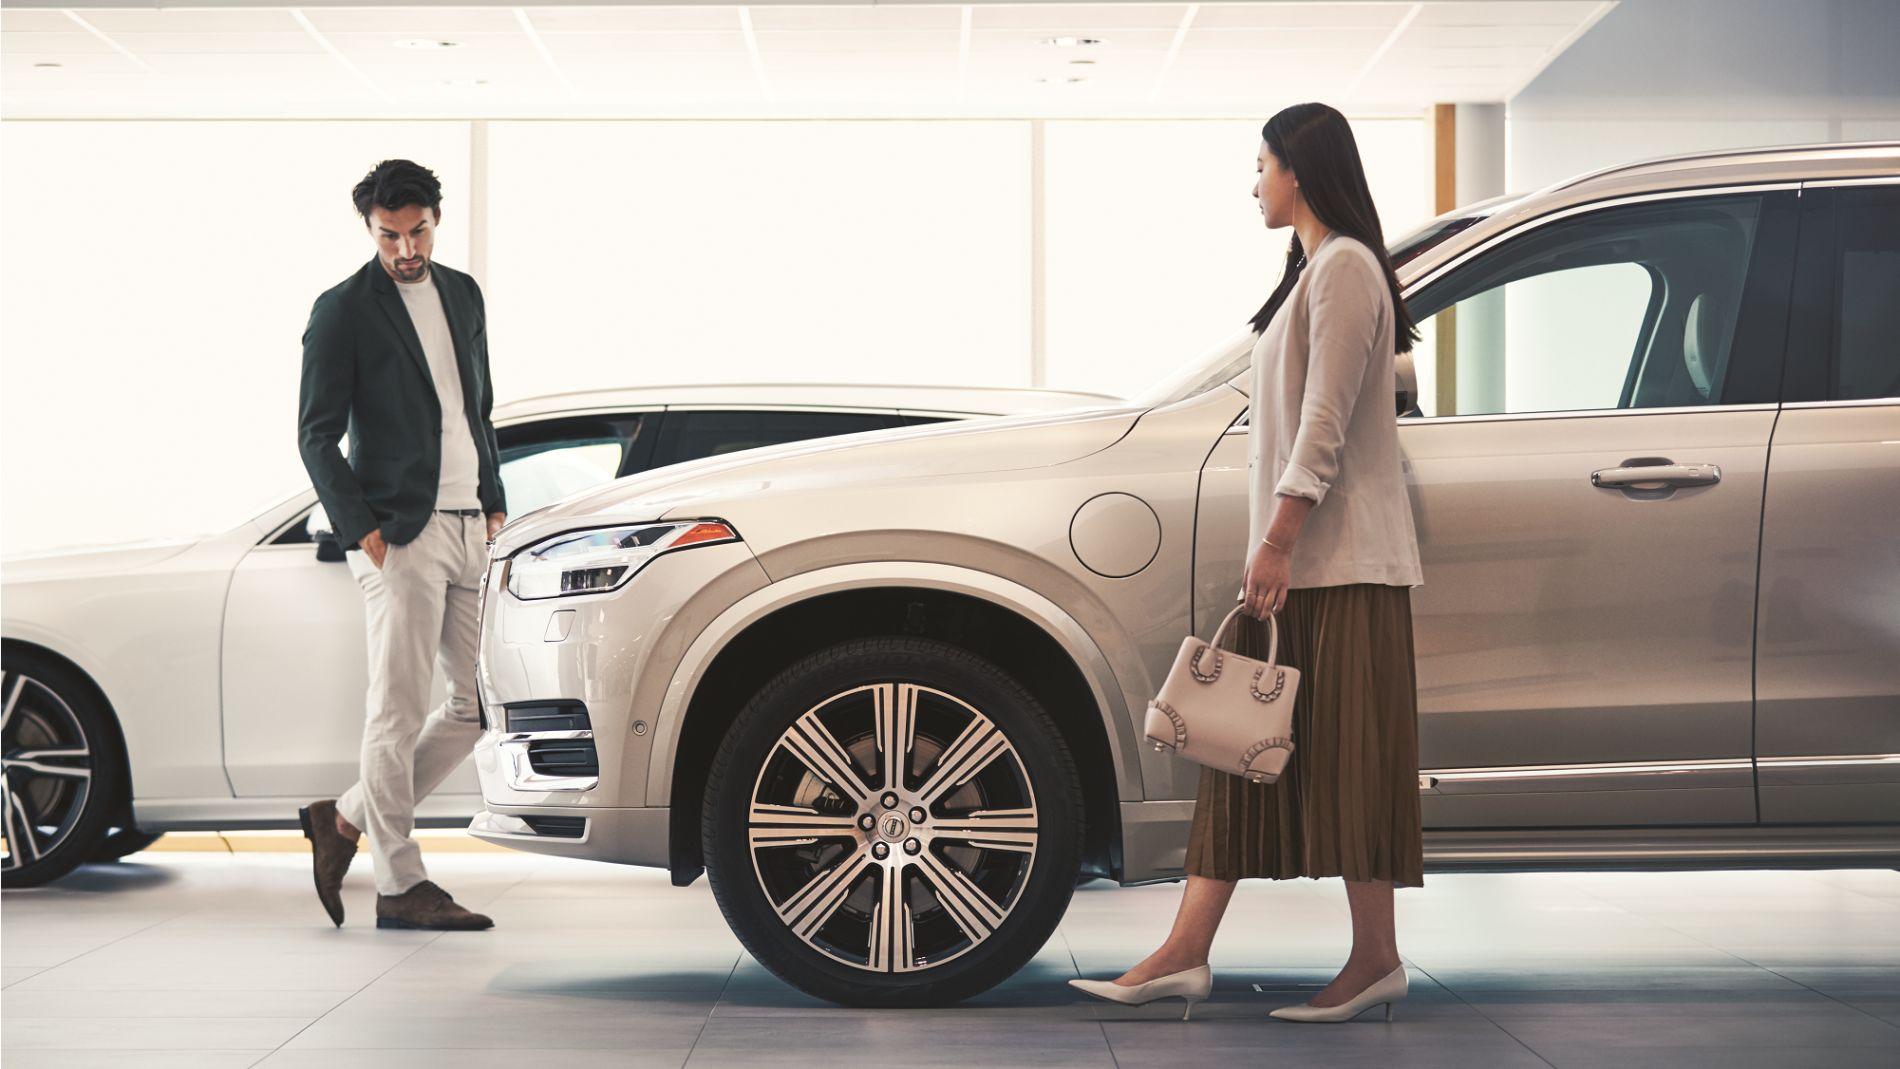 Додаткова персональна гарантія* на запчастини Volvo